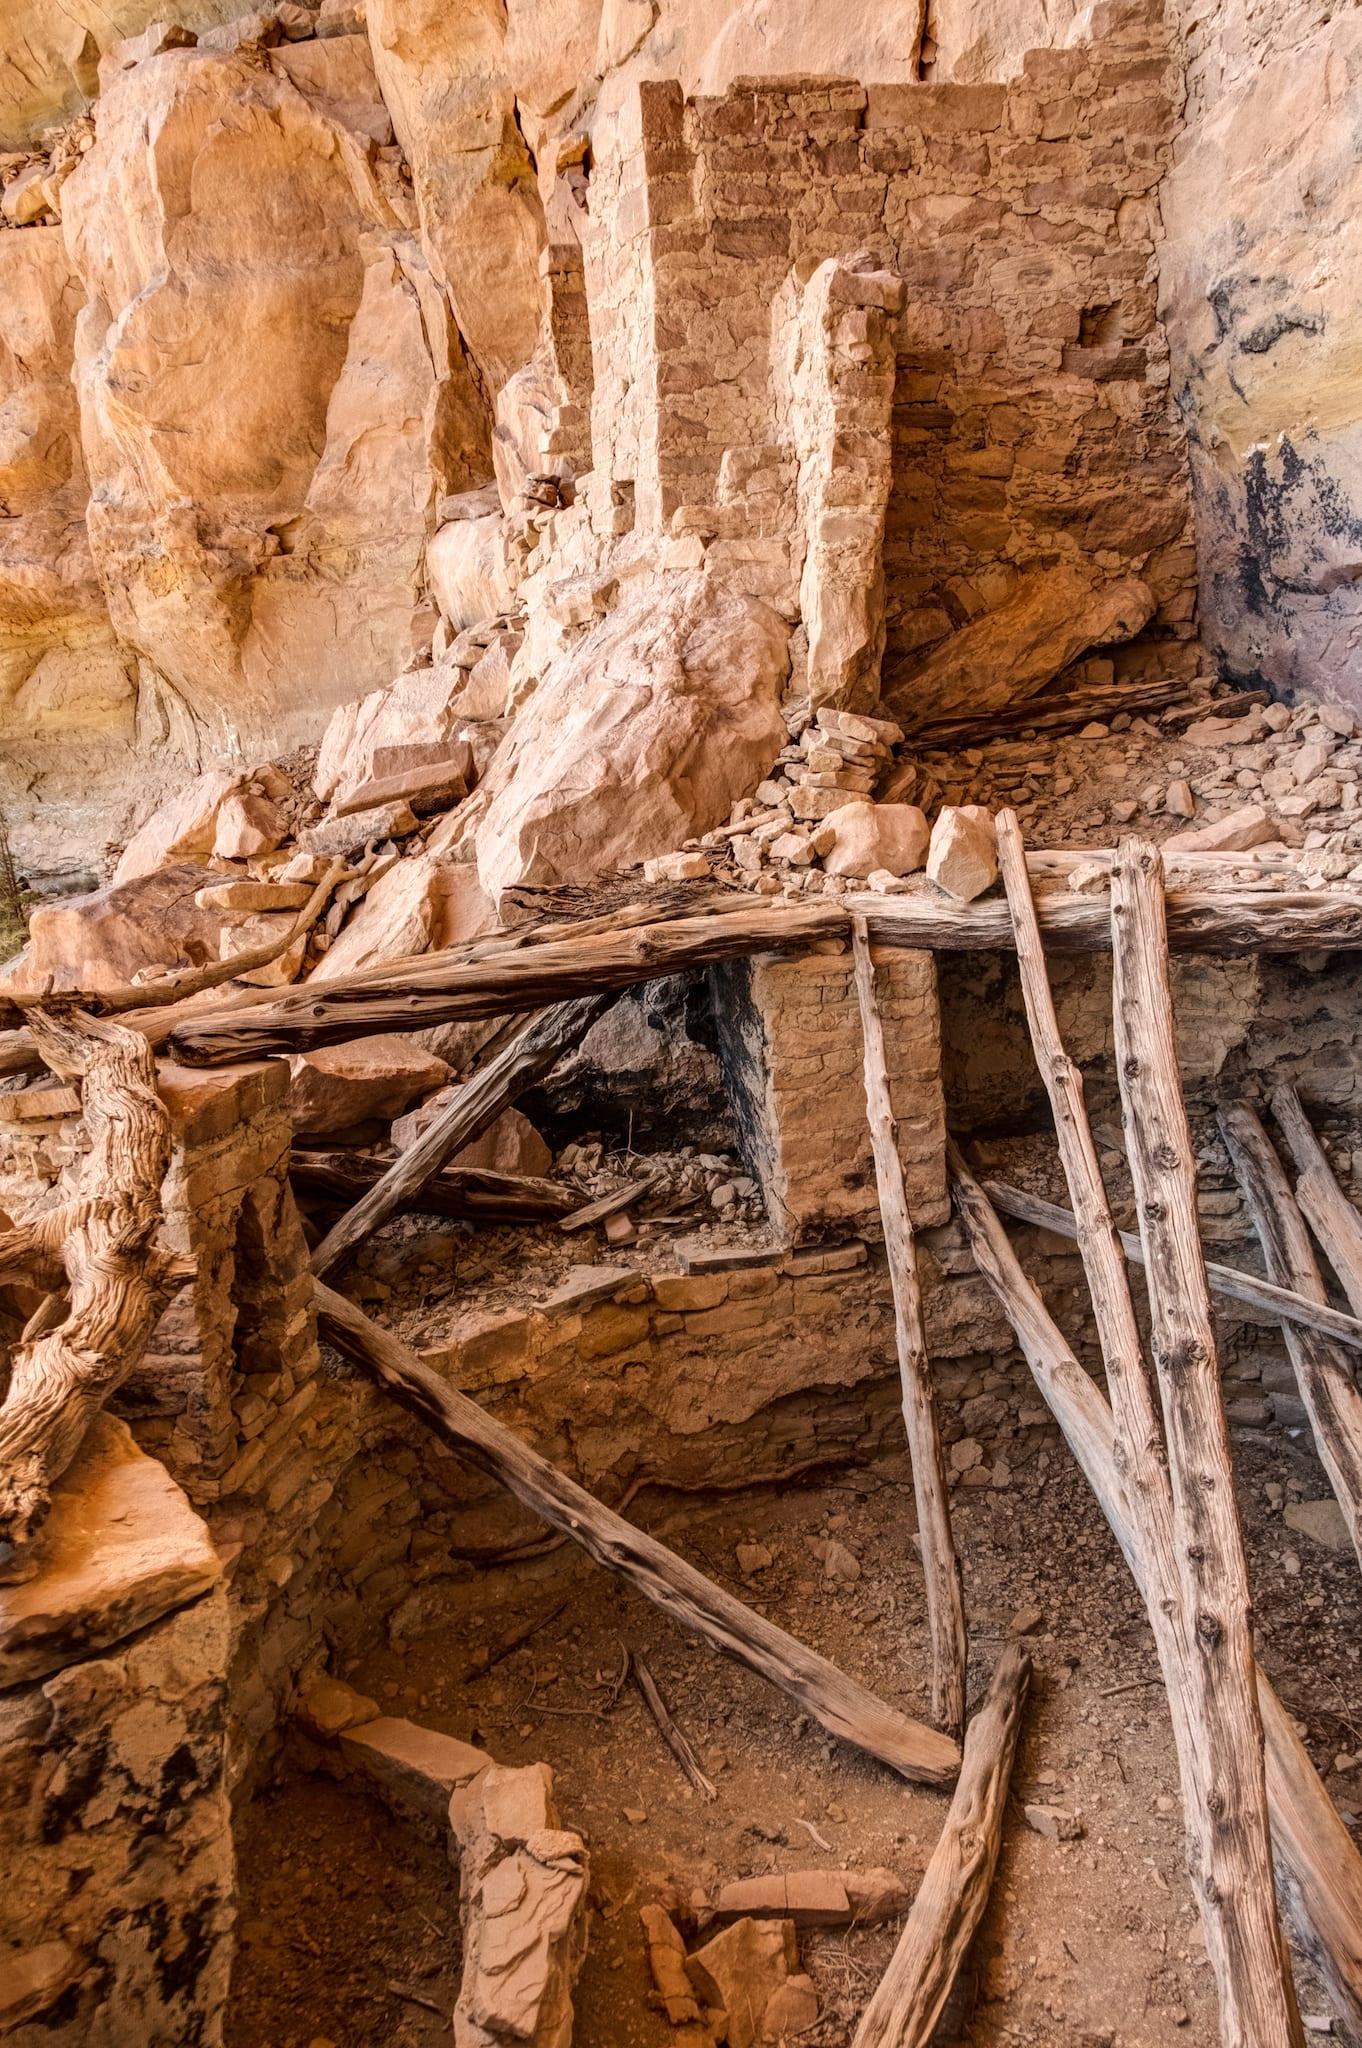 Ute Mountain Tribal Park Collapsed Kiva Ruin